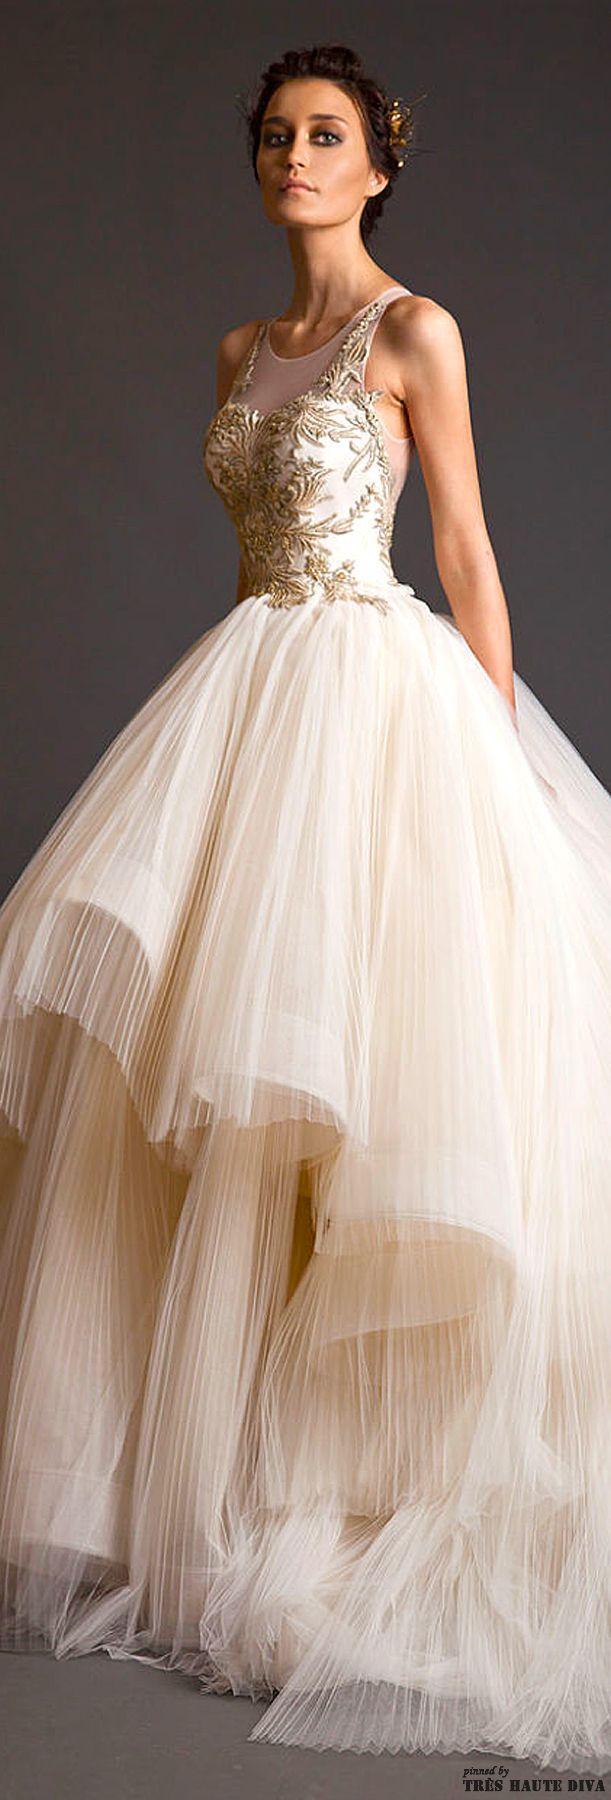 Wedding - Going To Get Maaaarried